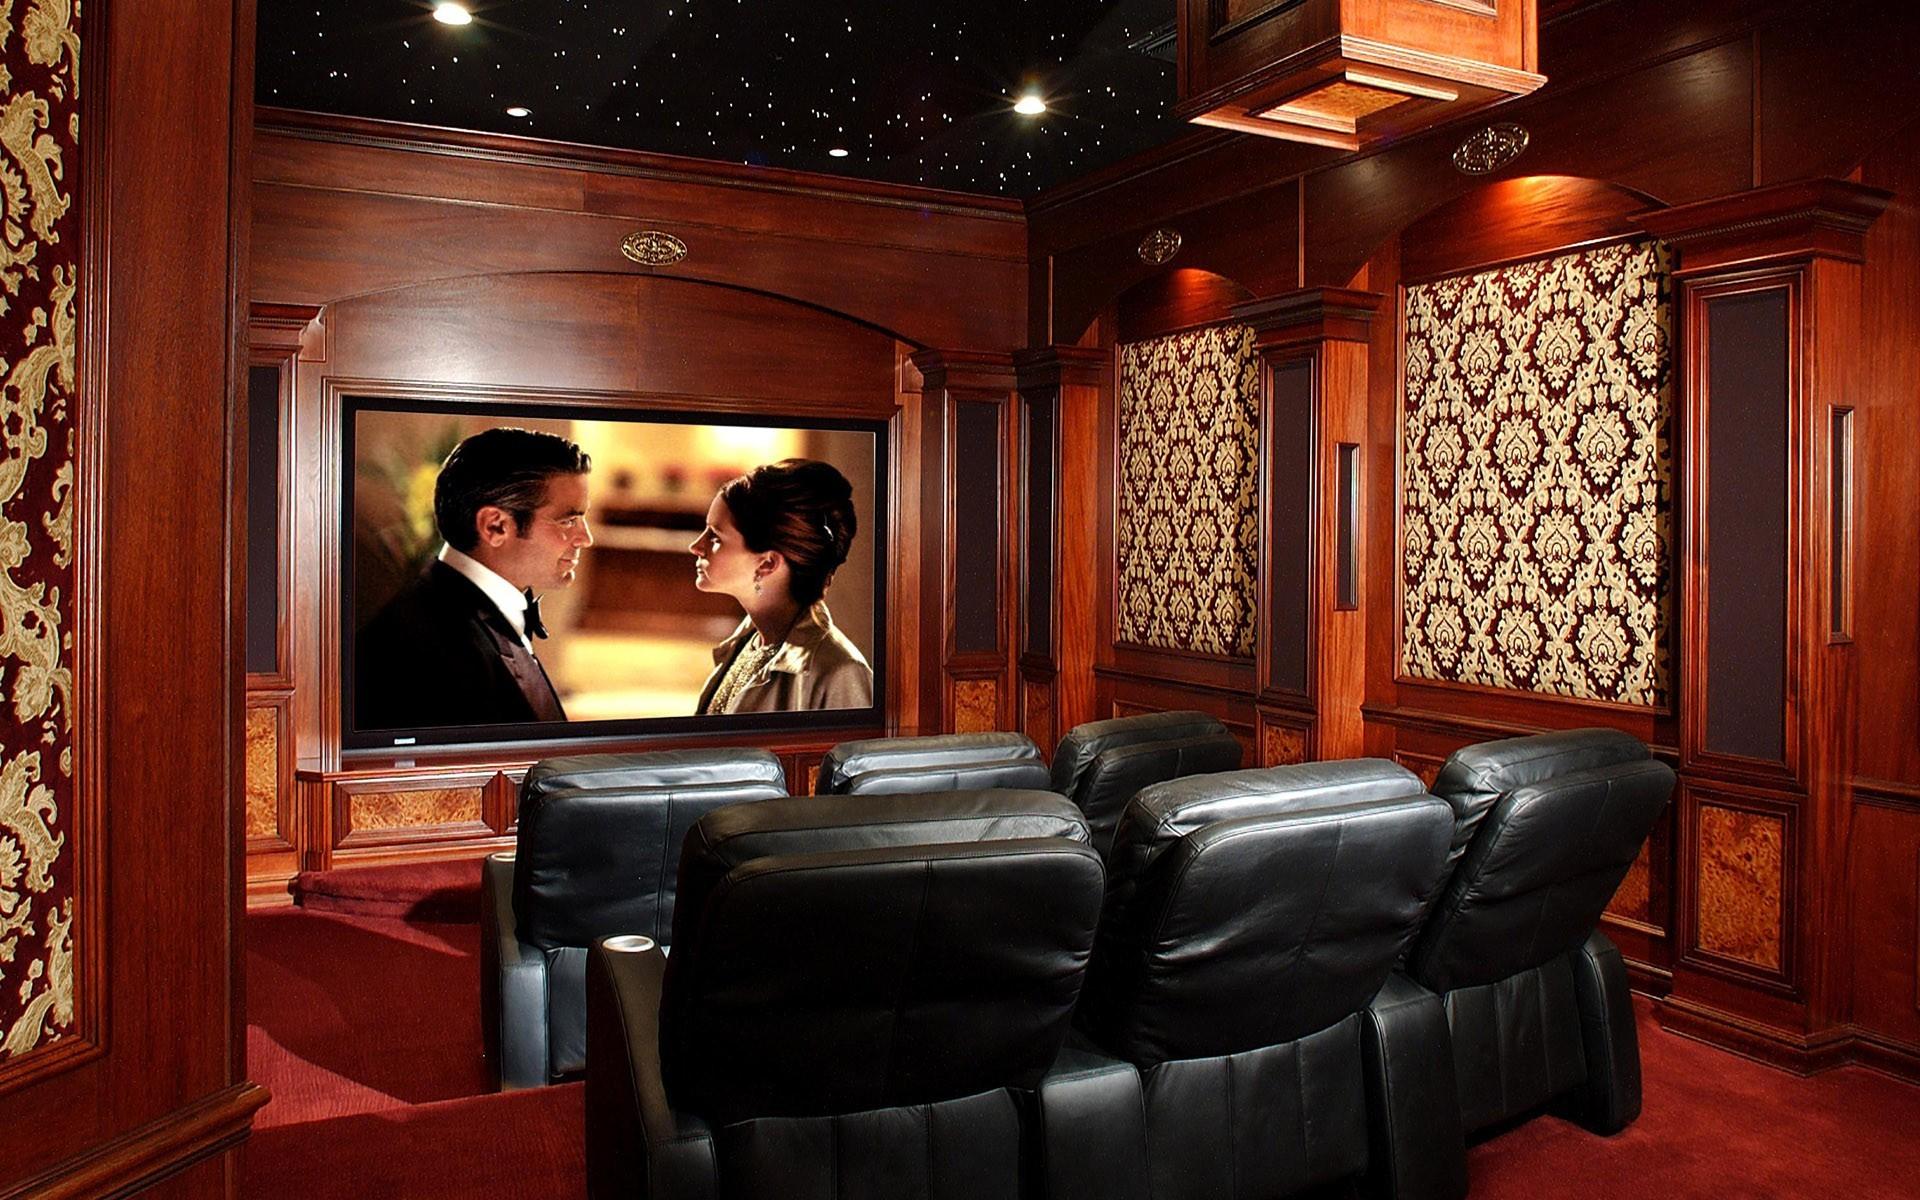 47 movie theater wallpaper on wallpapersafari - Home theater wallpaper ...